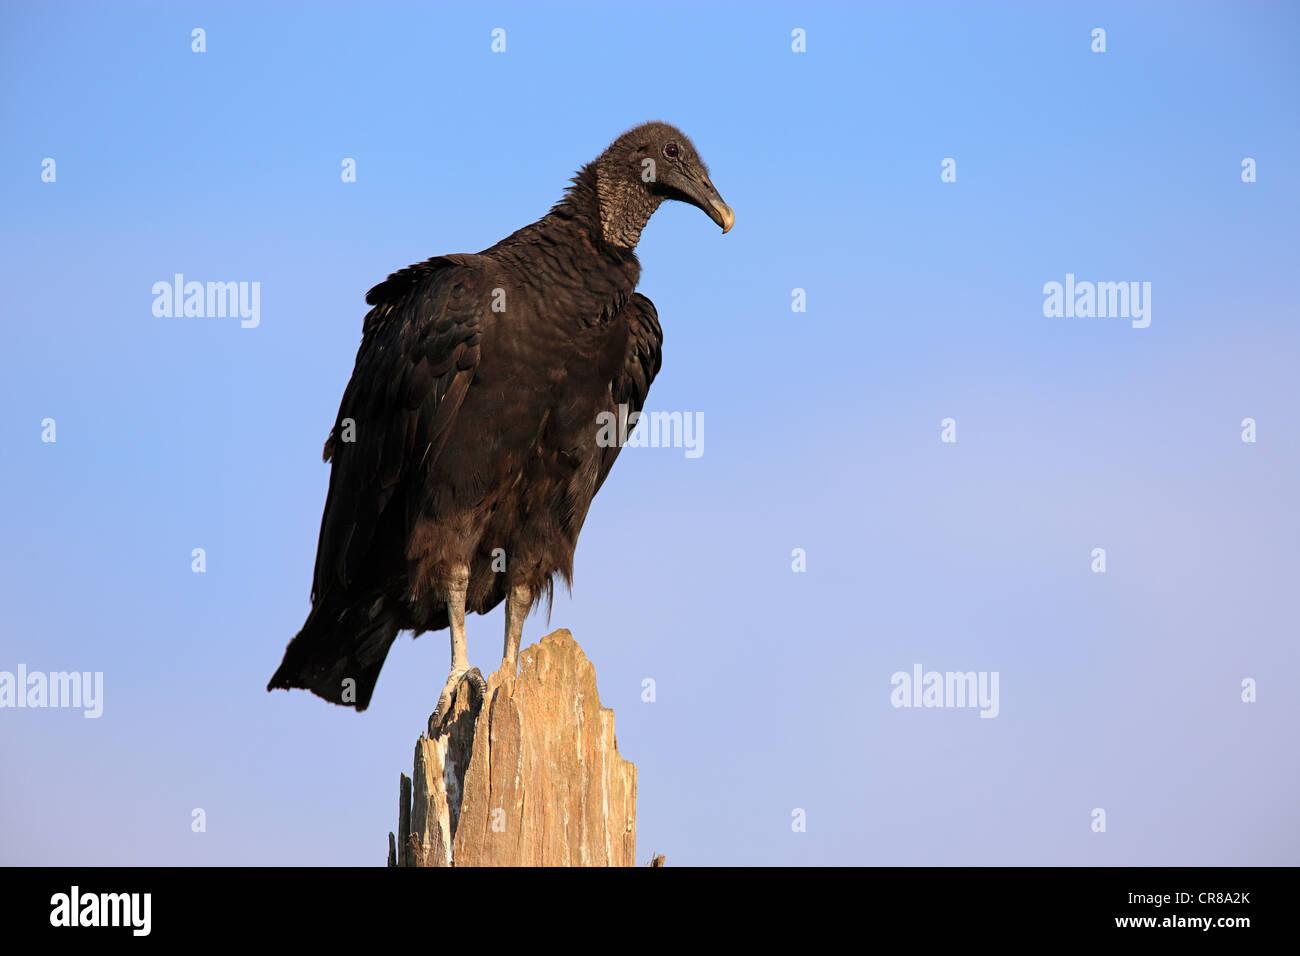 Schwarzer Geier (Coragyps Atratus), Erwachsene thront, Florida, USA, Amerika Stockbild